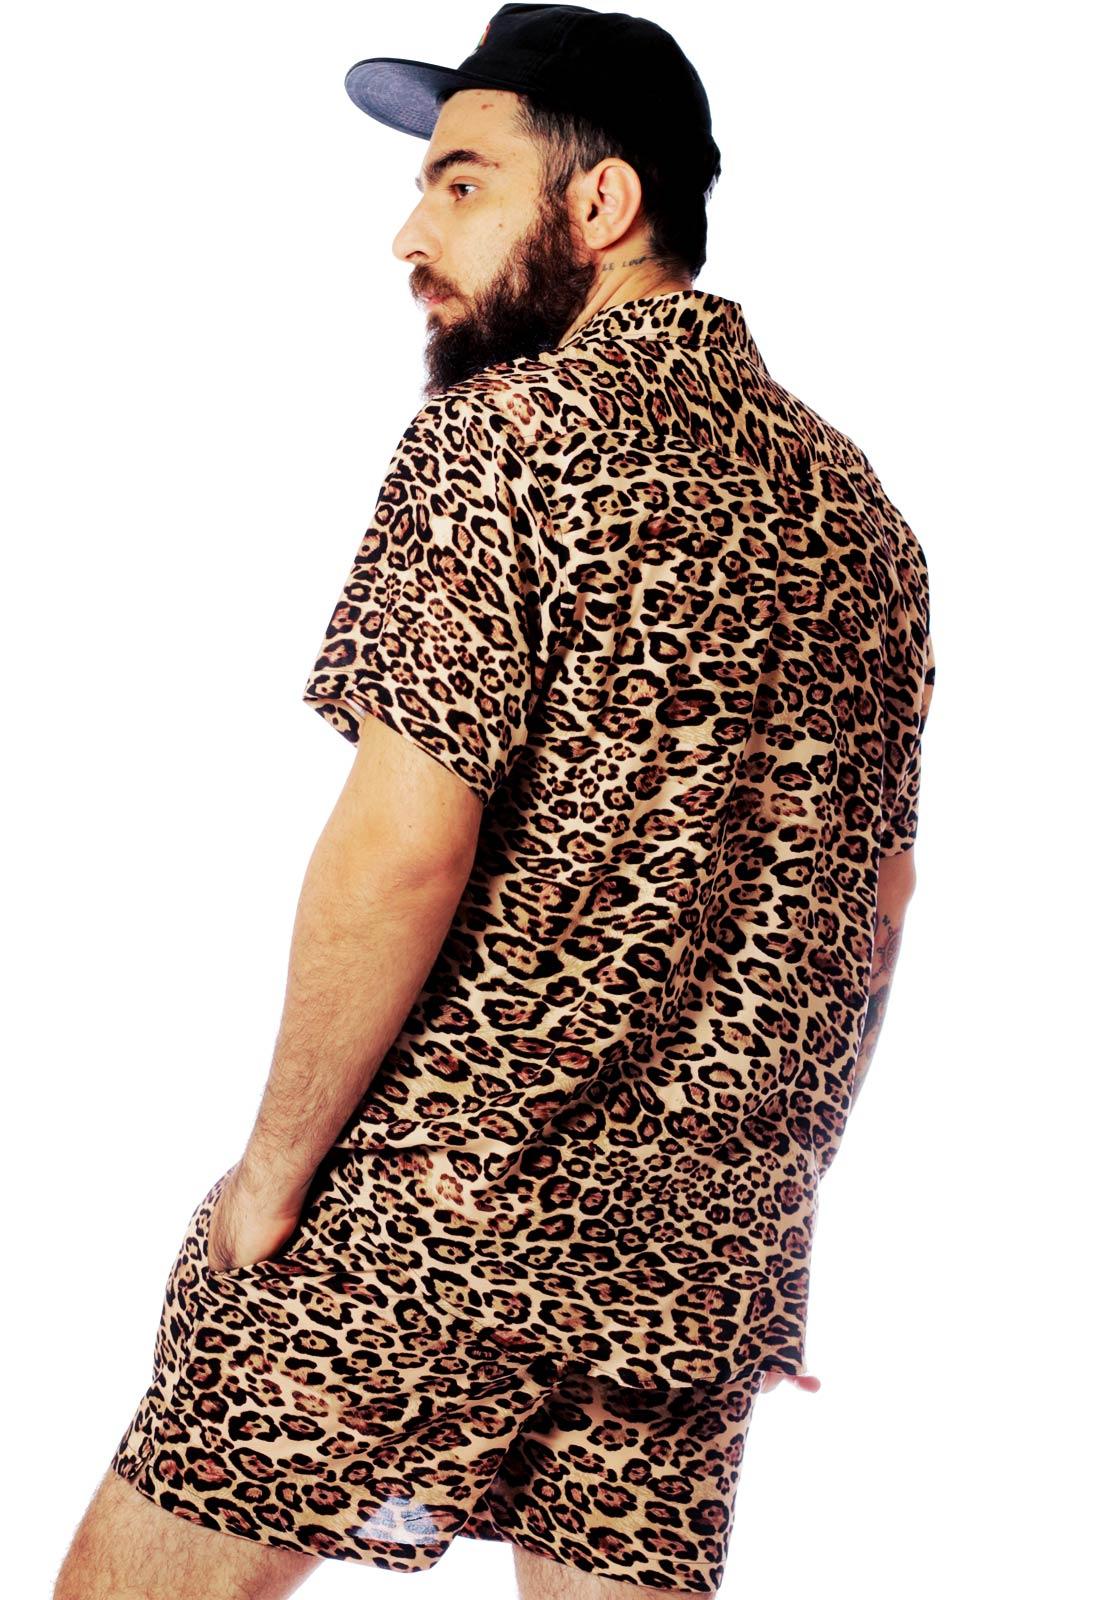 Conjunto Oncinha Estampado Animal Print Camisa + Shorts Unissex Onça